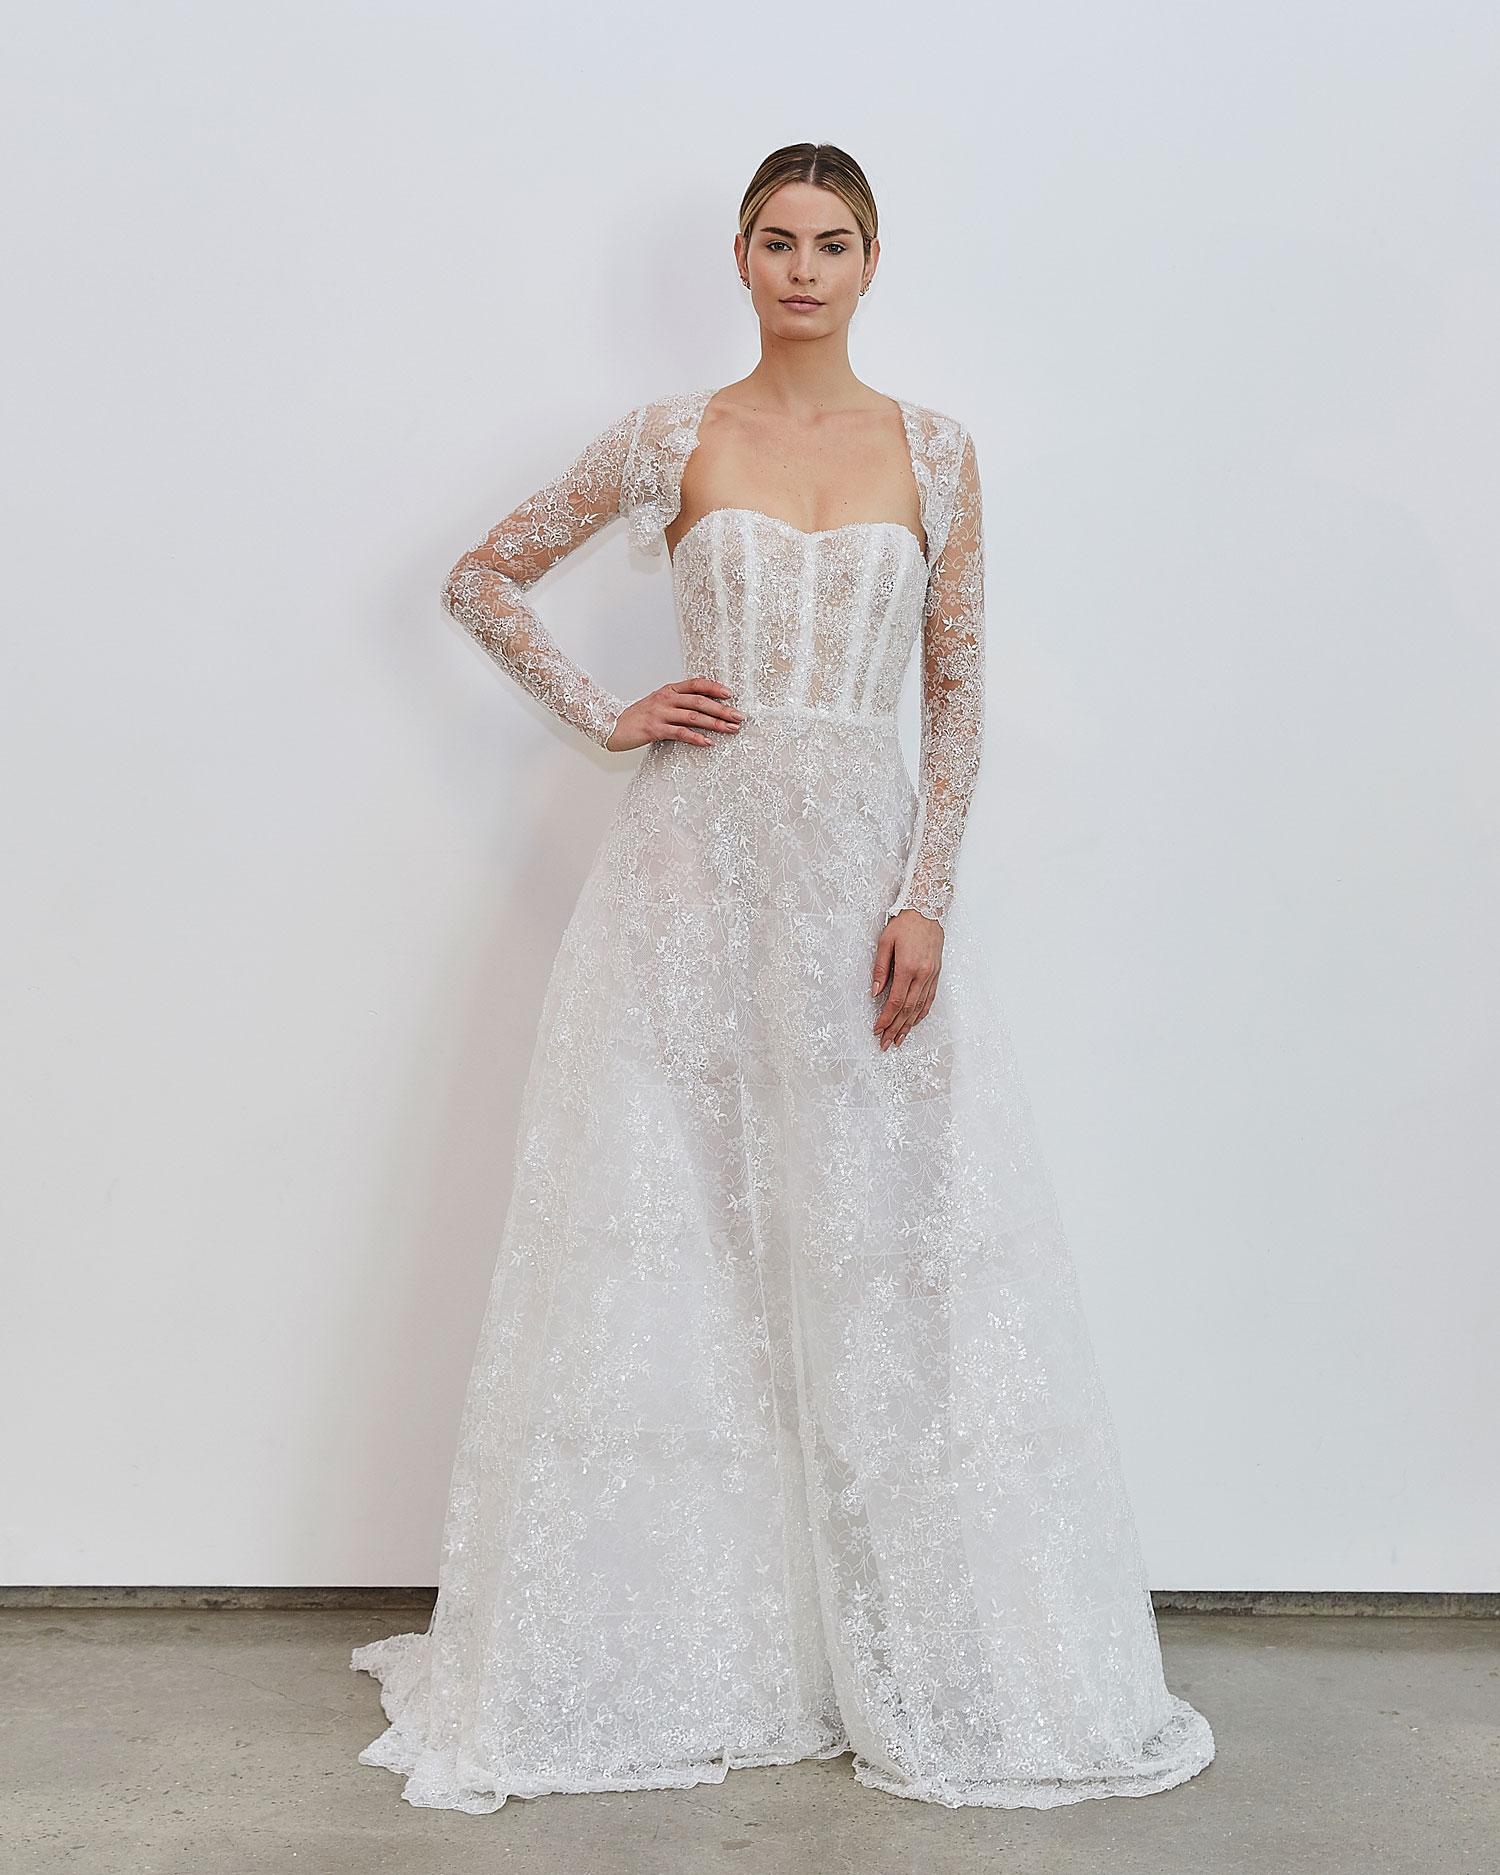 Francesca Miranda Fall 2020 bridal collection Antoinne strapless wedding dress corset bodice long sleeve bolero jacket